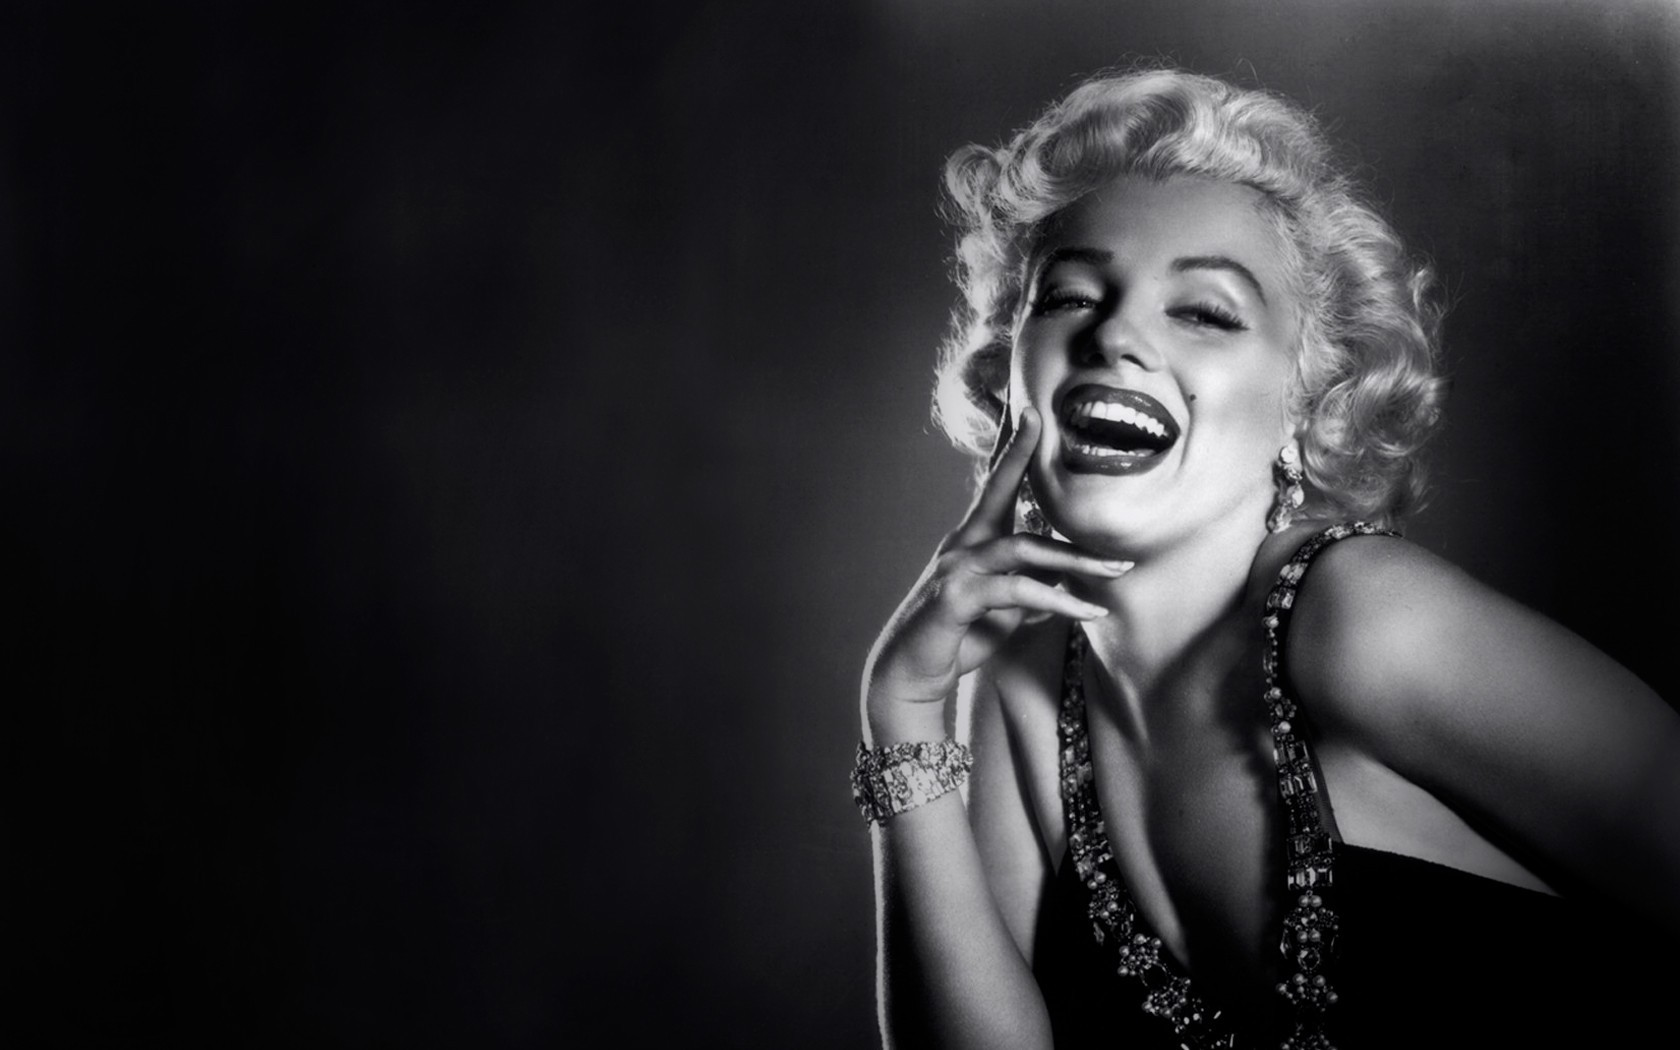 Citaten Marilyn Monroe Ga : Marilyn monroe quot atrévete a brillar